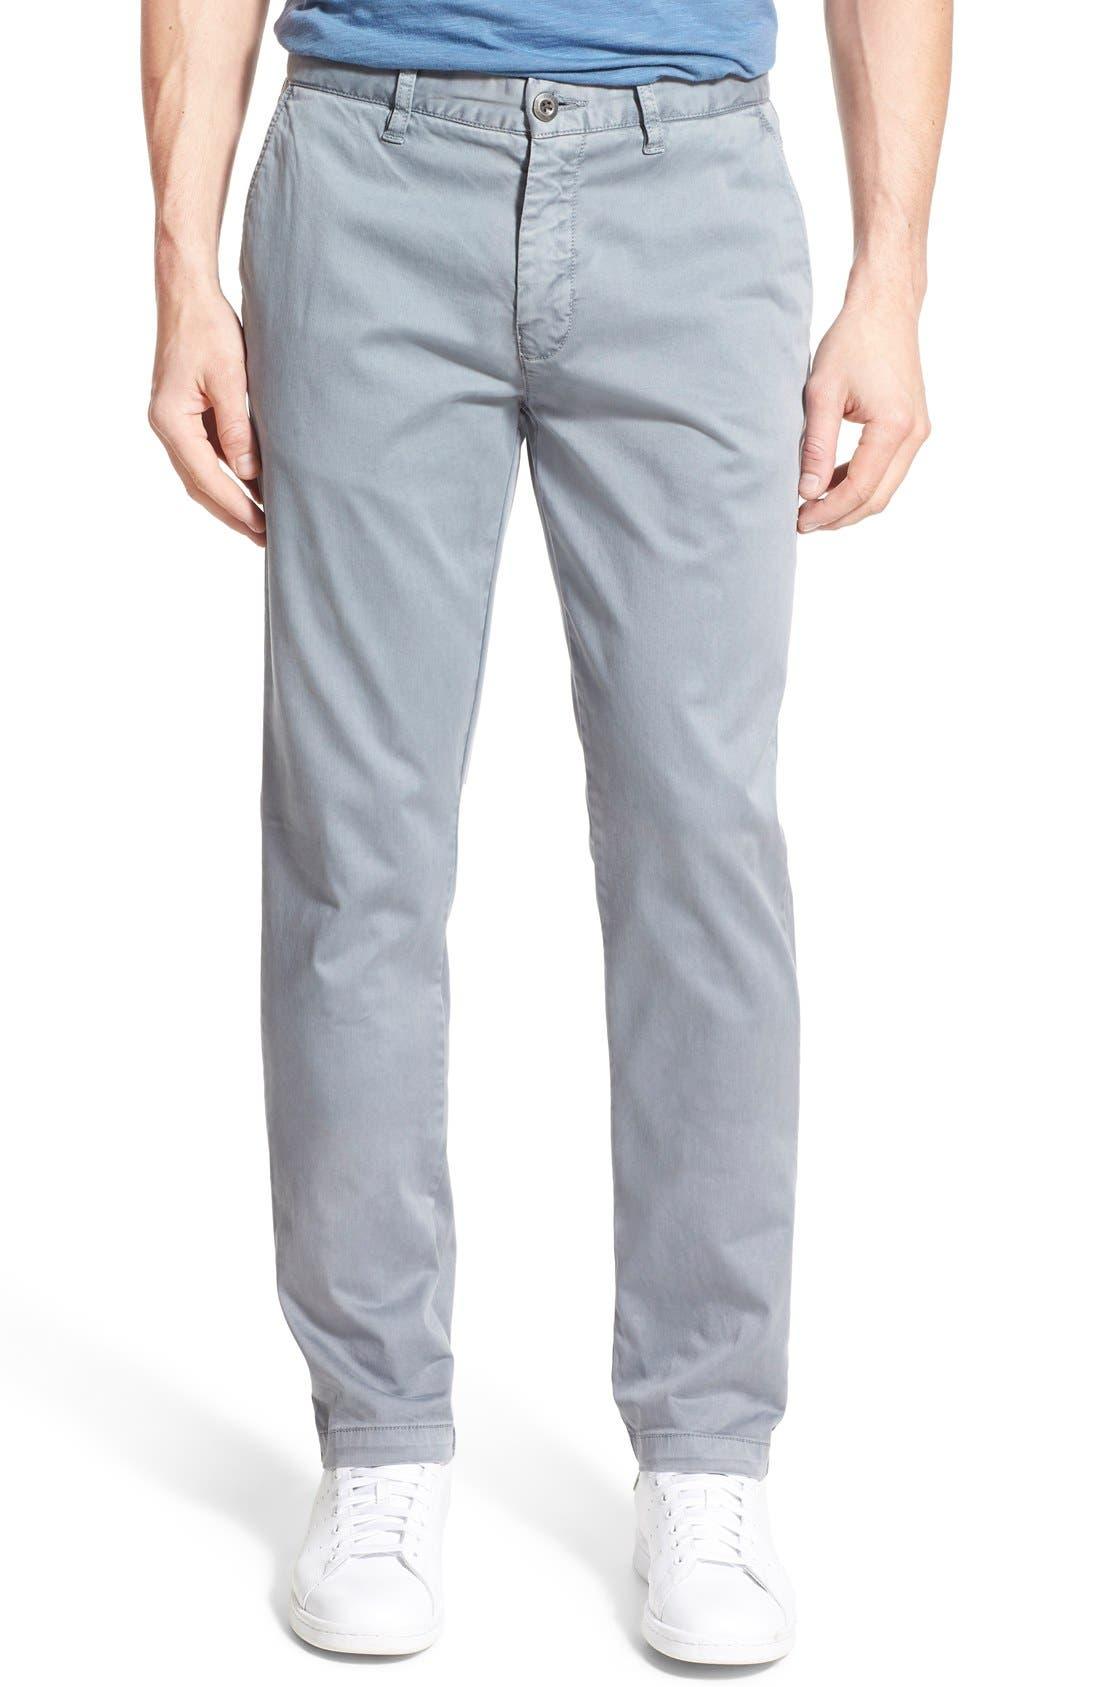 ORIGINAL PAPERBACKS 'Richmond' Chino Pants